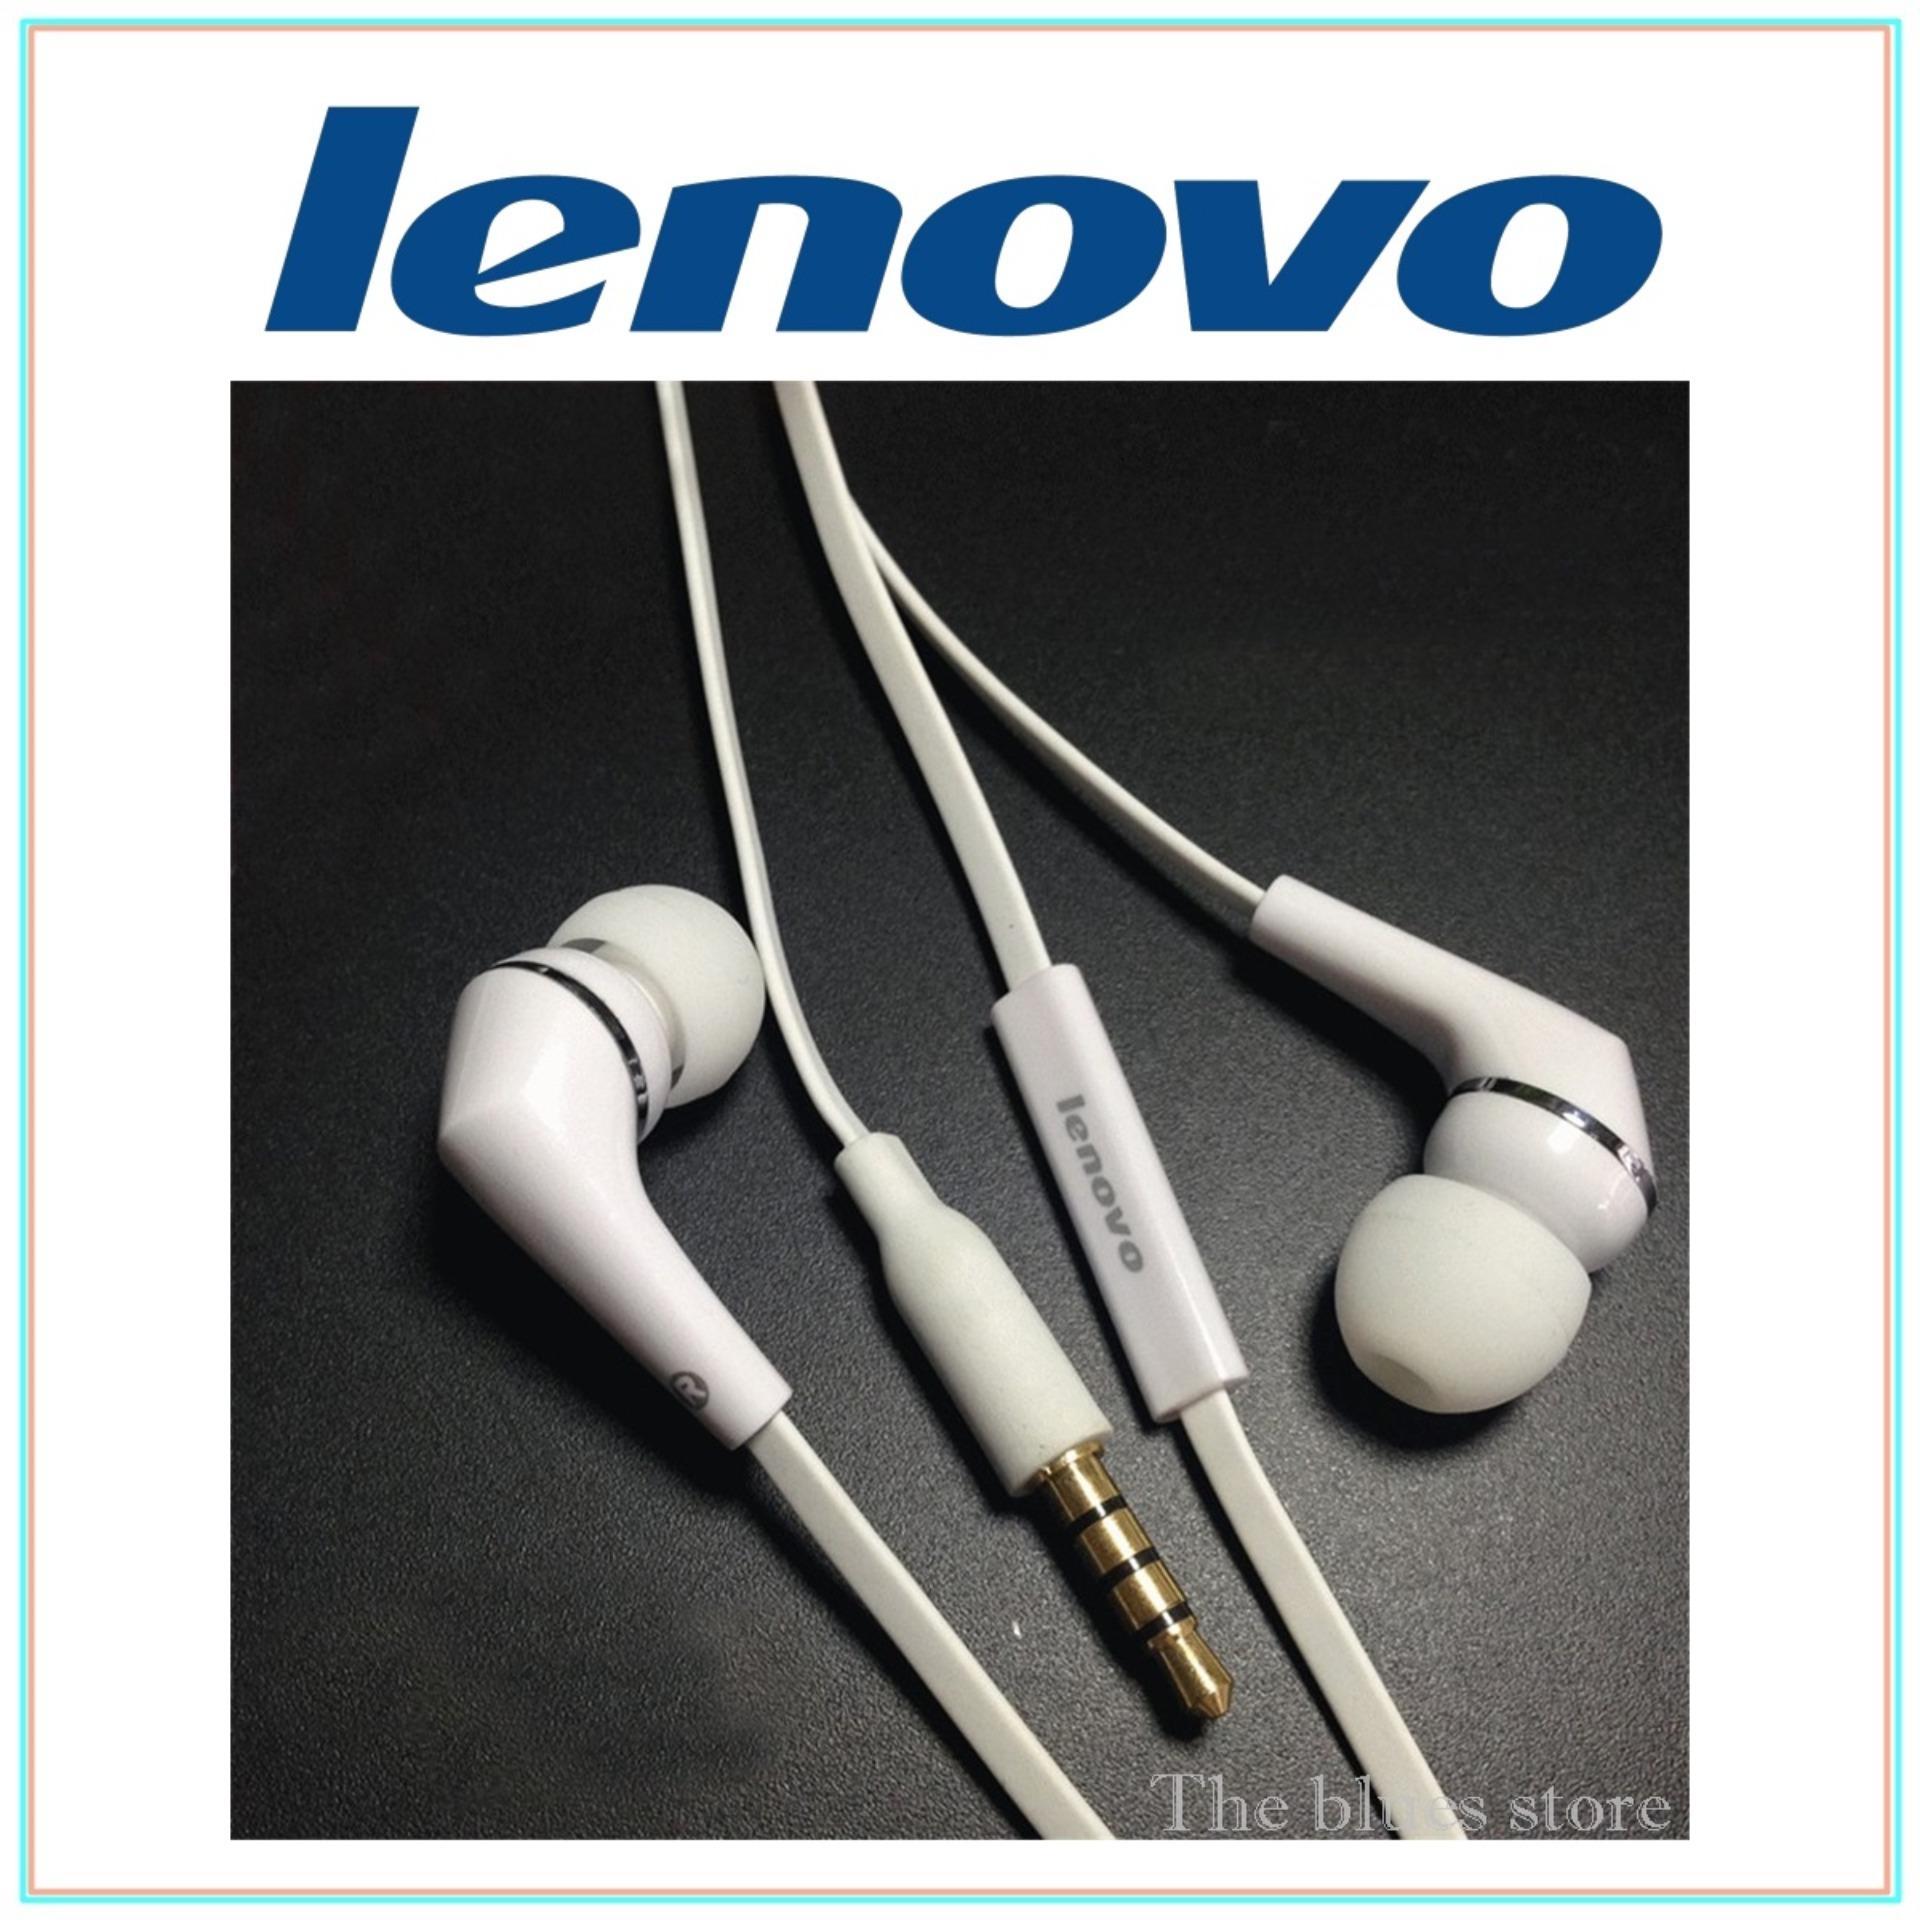 Lenovo Handsfree/Headset/Earphone LH102 - Original